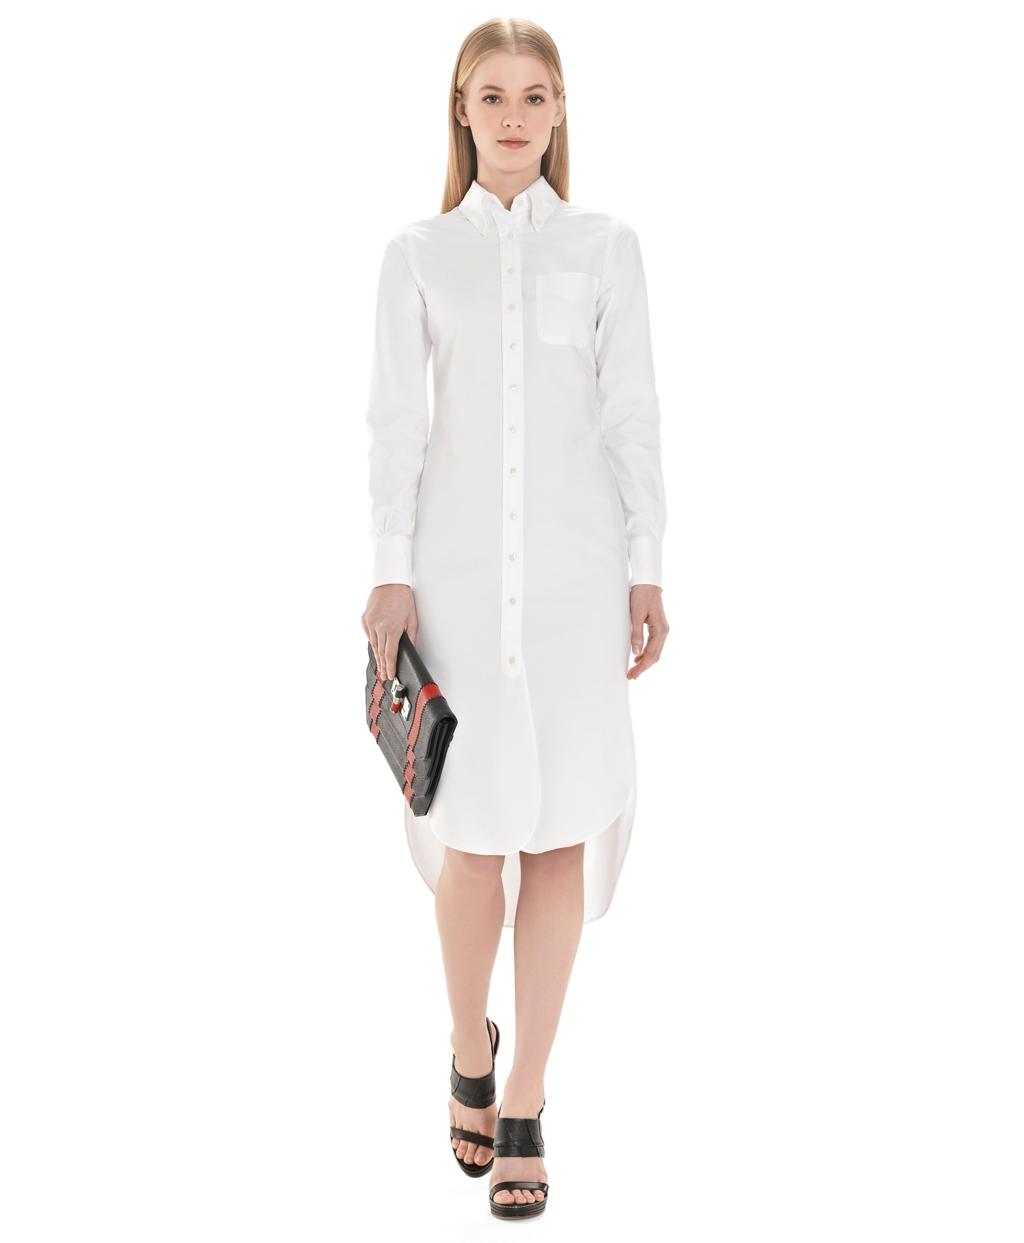 White shirt dress gunda daras for White dress workout shirt